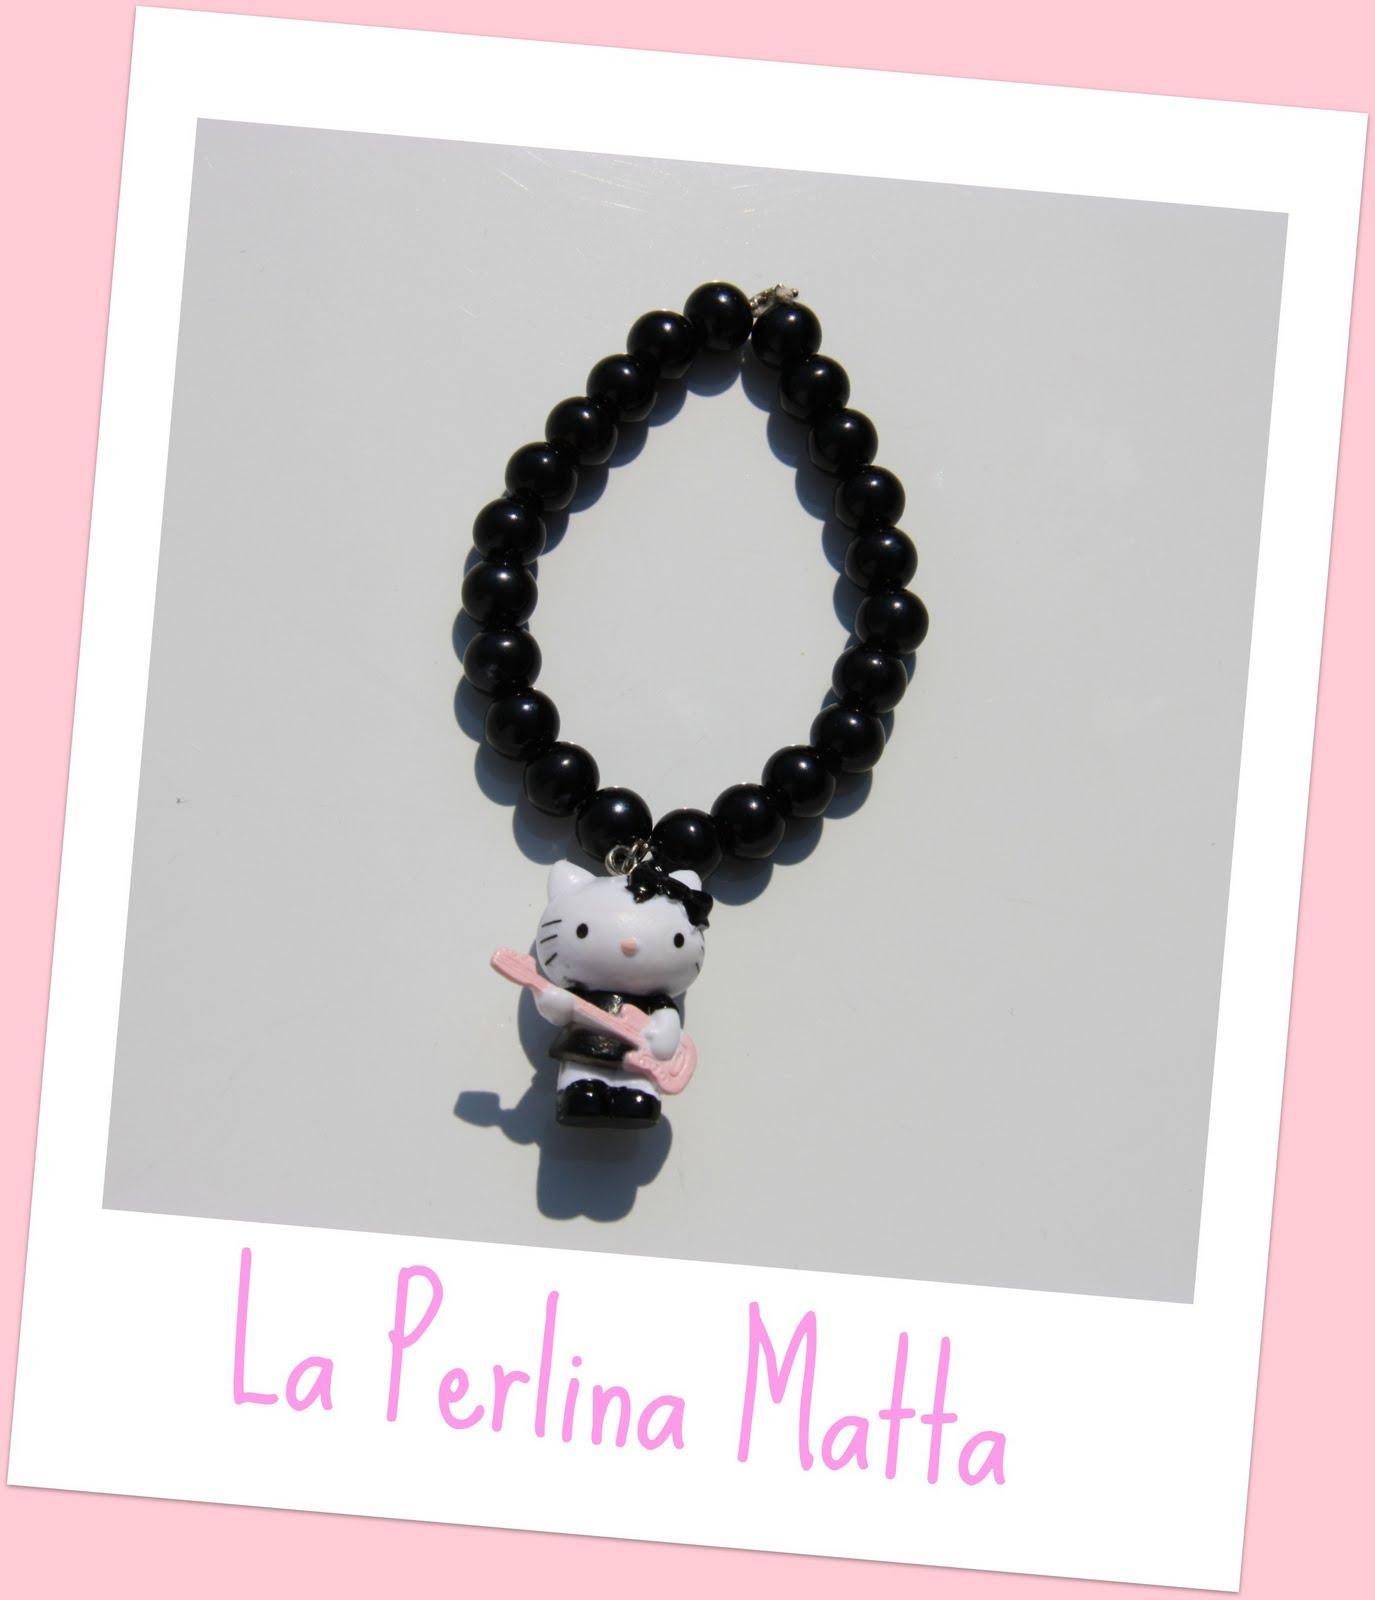 http://1.bp.blogspot.com/-XsReS0jrYbE/TeIw3Vsrl9I/AAAAAAAAAB8/uBLiFXatJxg/s1600/Bracciale+Hello+Kitty+Rock+perle+nere.jpg